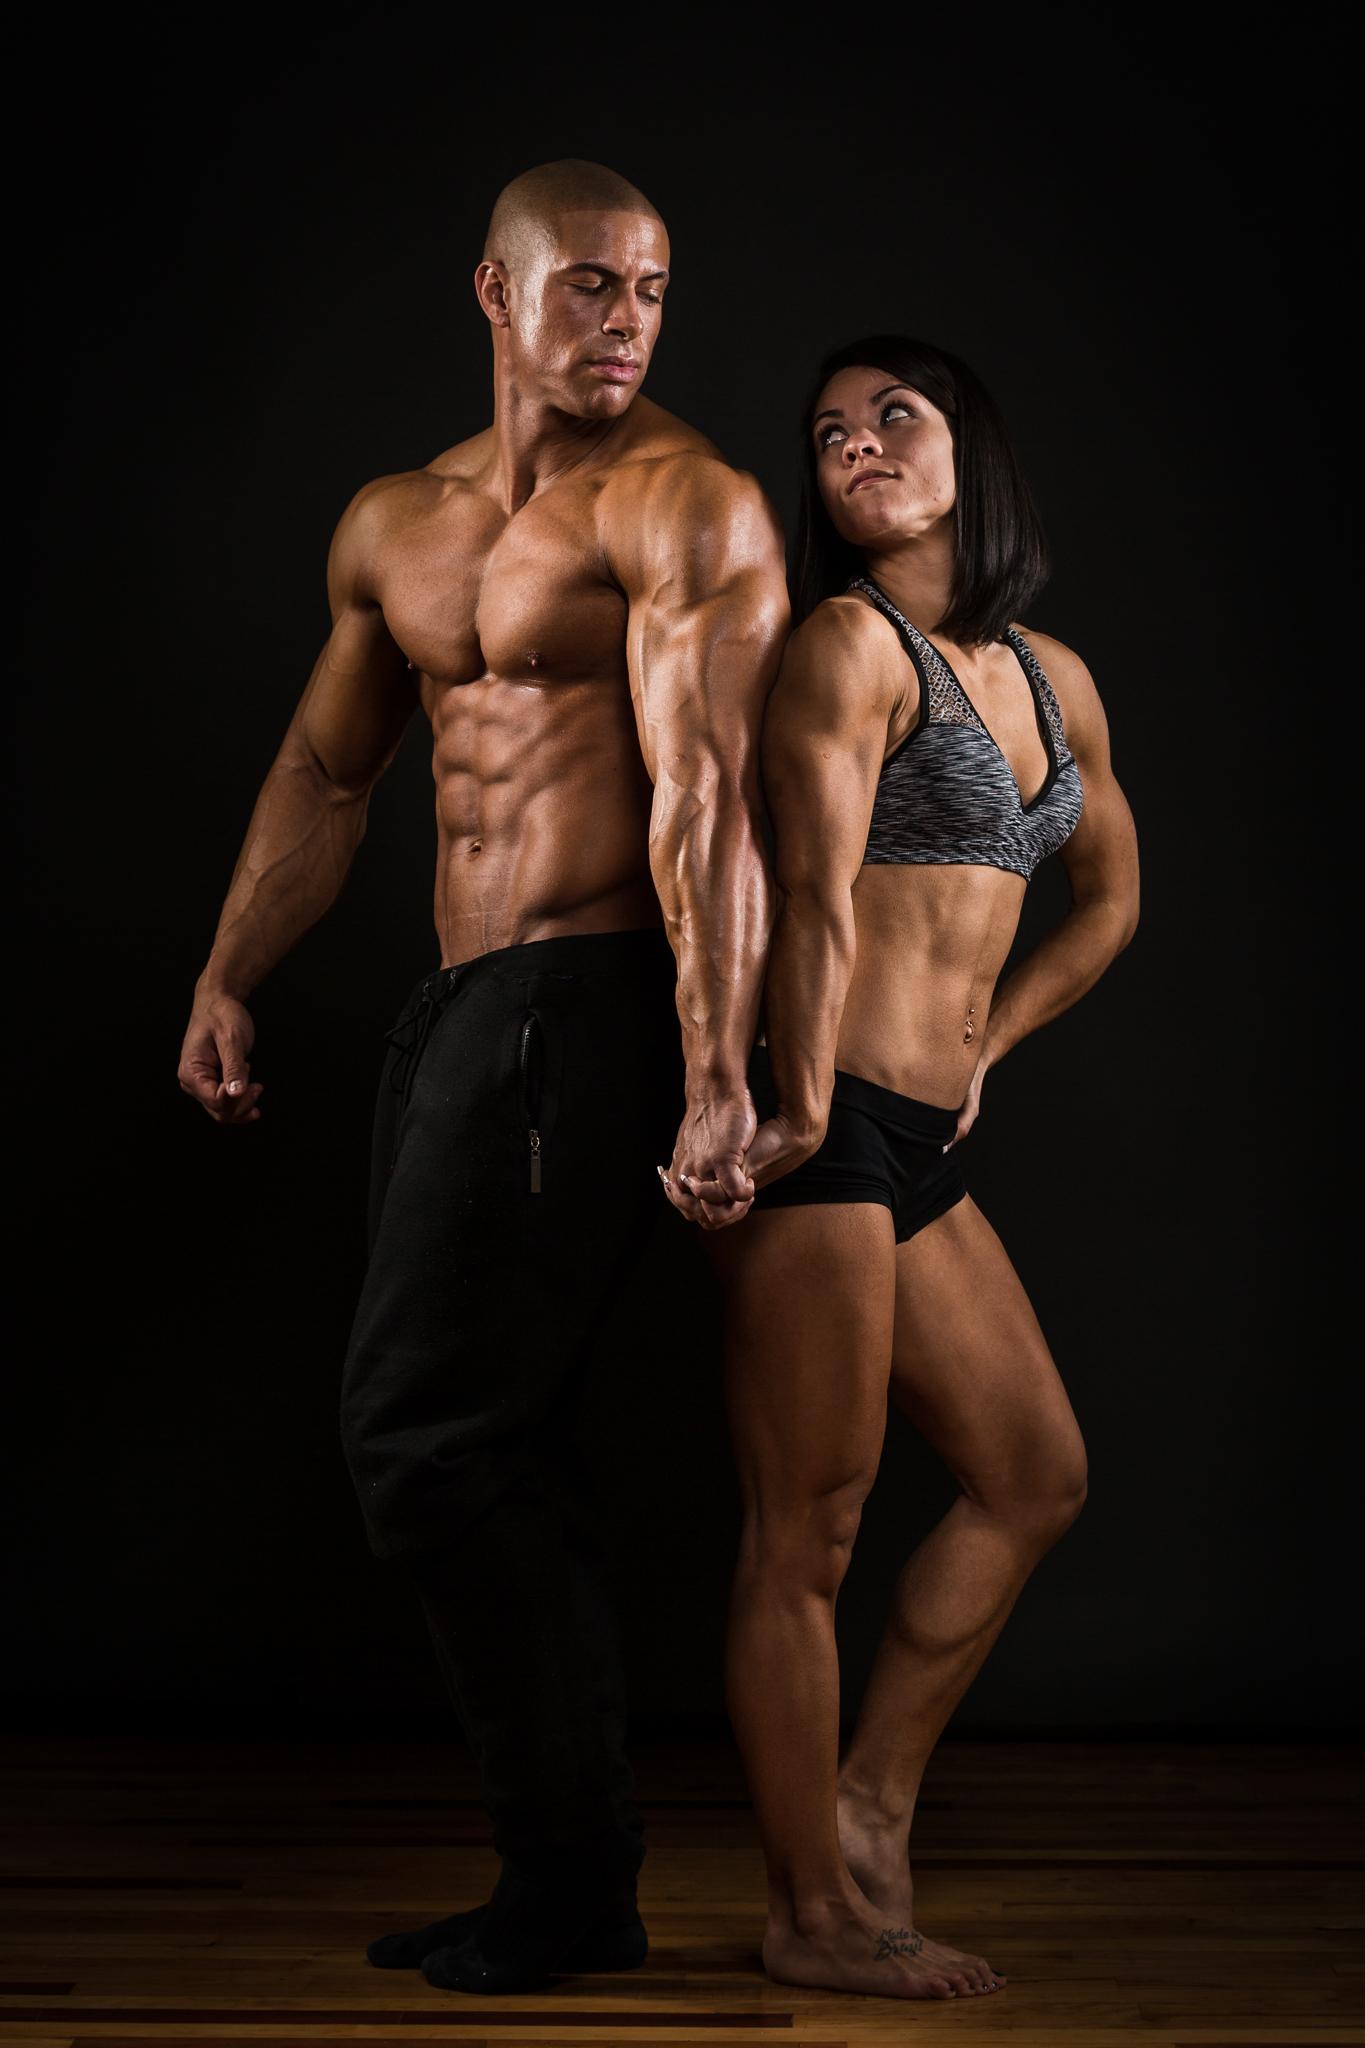 dover-new-hampshire-boston-fitness-photographer-photography-studio-12.jpg